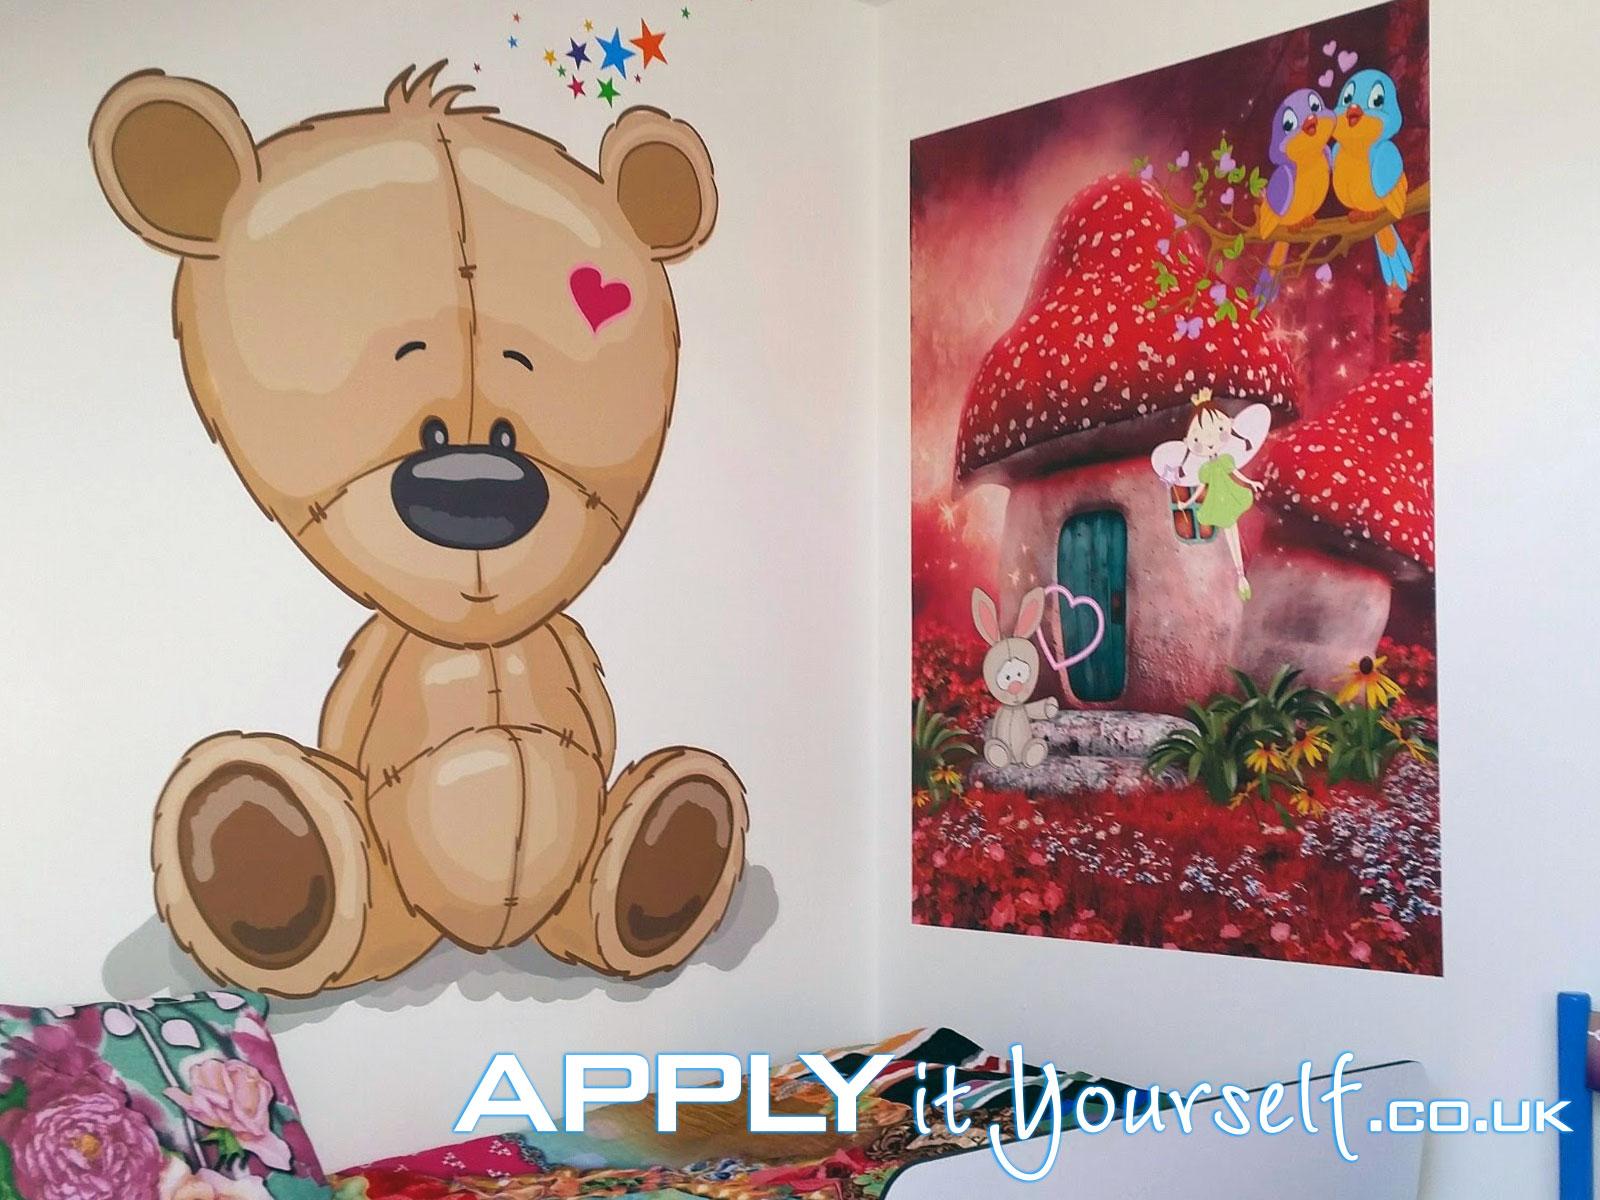 wall mural, prints, cut-to-shape, rectangular, kids, bedroom